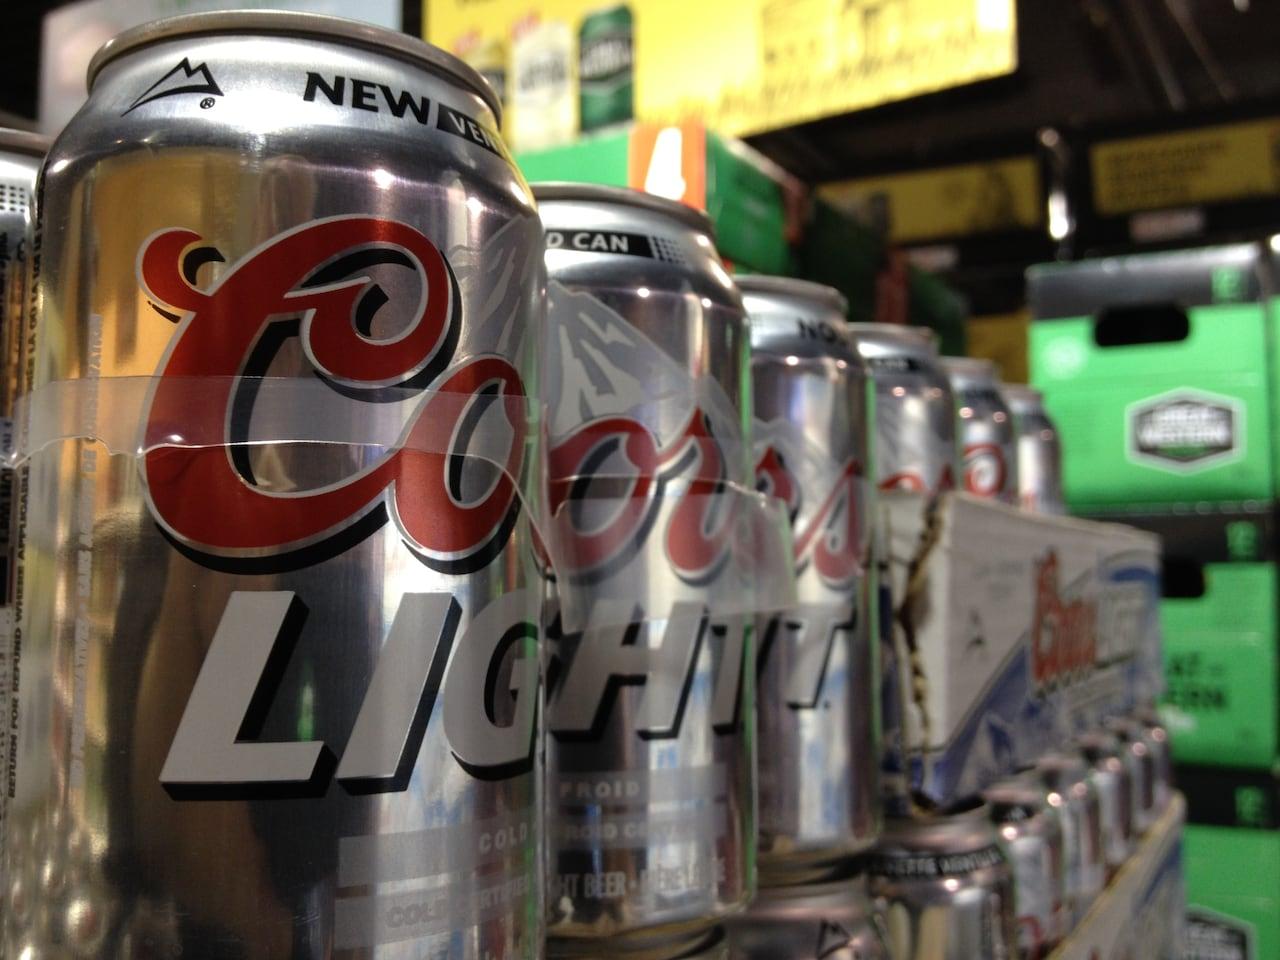 Sask  liquor authority crunching numbers on severance